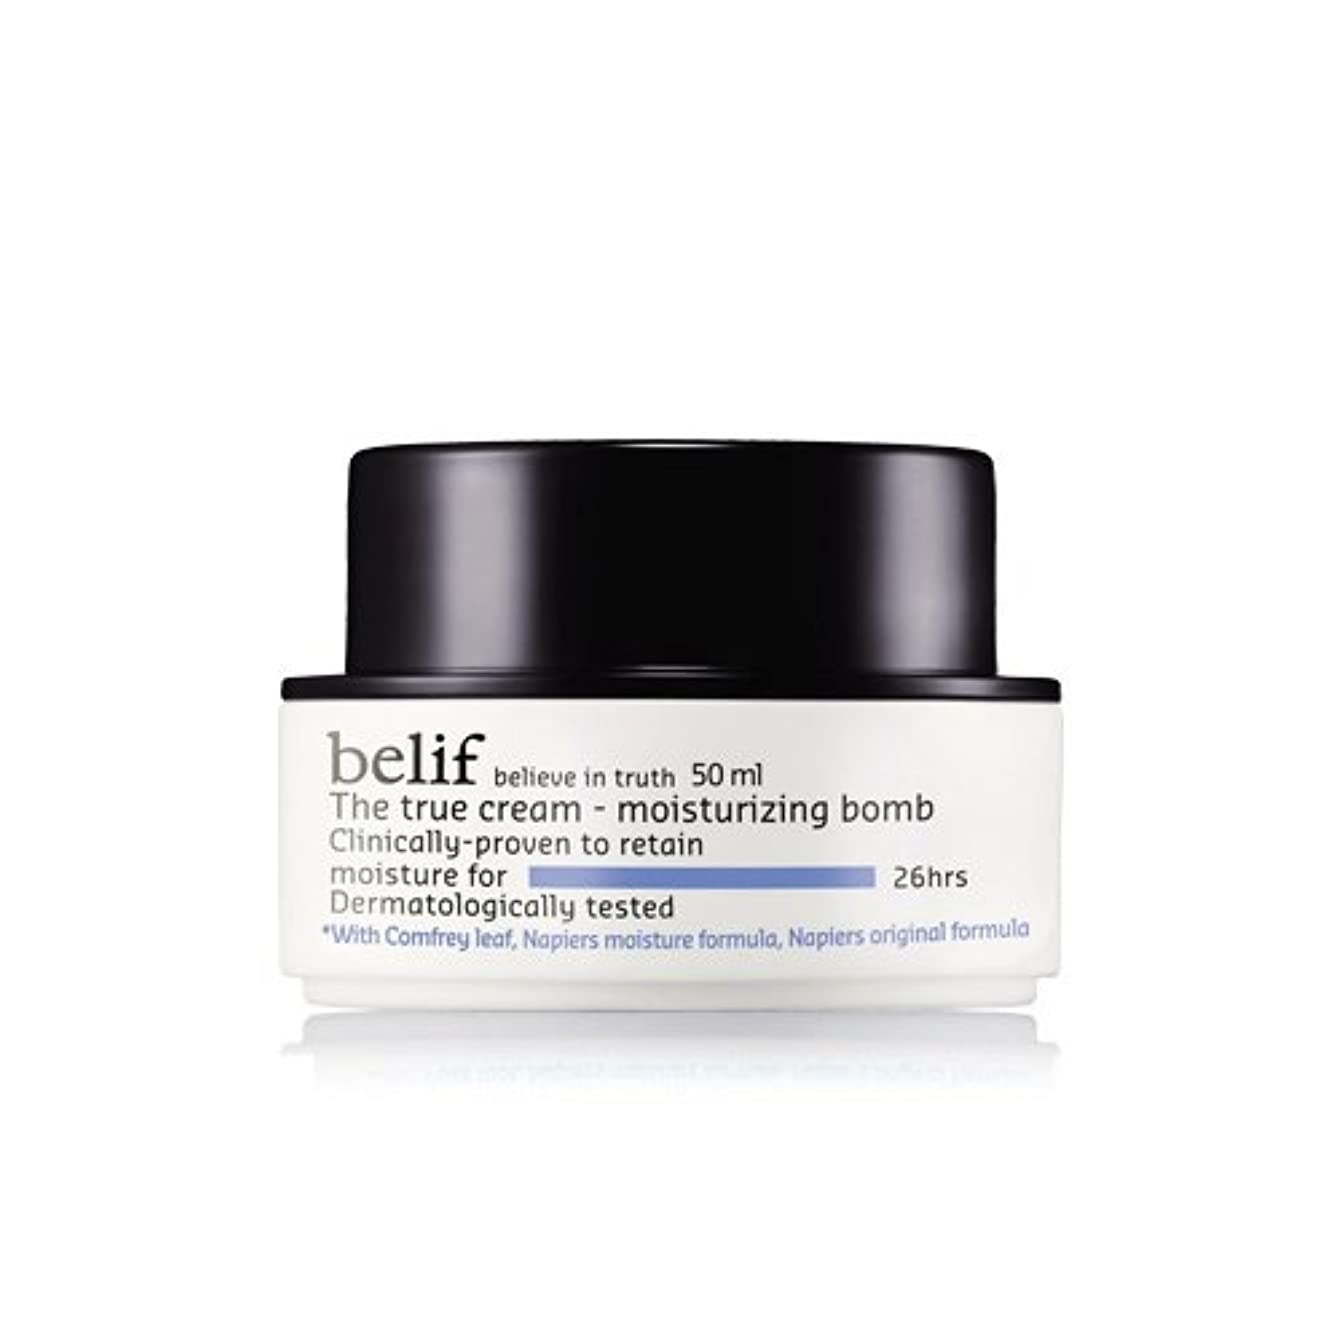 『belif The true cream-moisturizing bomb 50ml』 ビリーフ 水分爆弾クリーム50ml 【福袋】